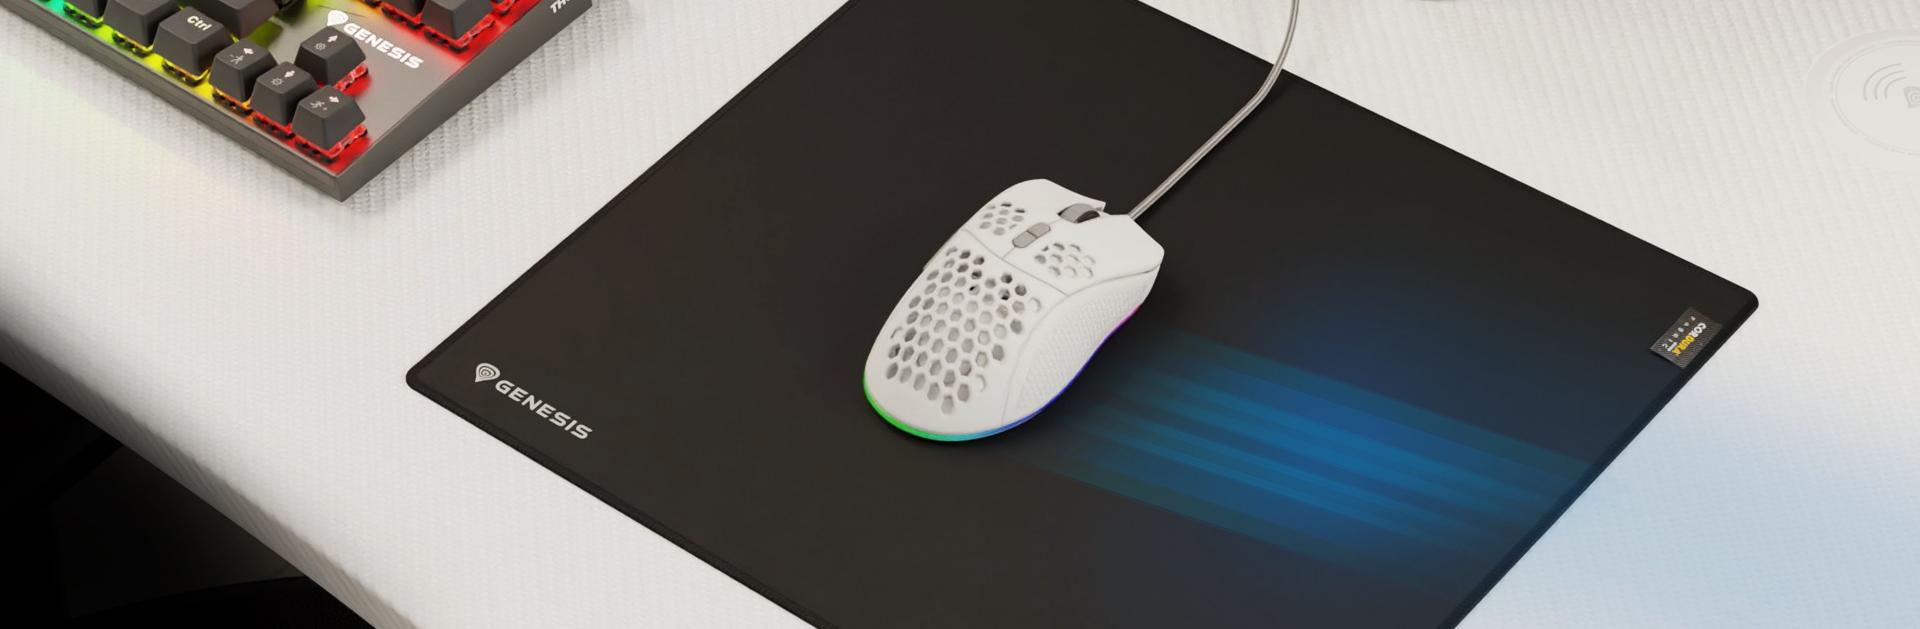 mouse pad genesis carbon 700 cordura xl 450 x 400 mm 5